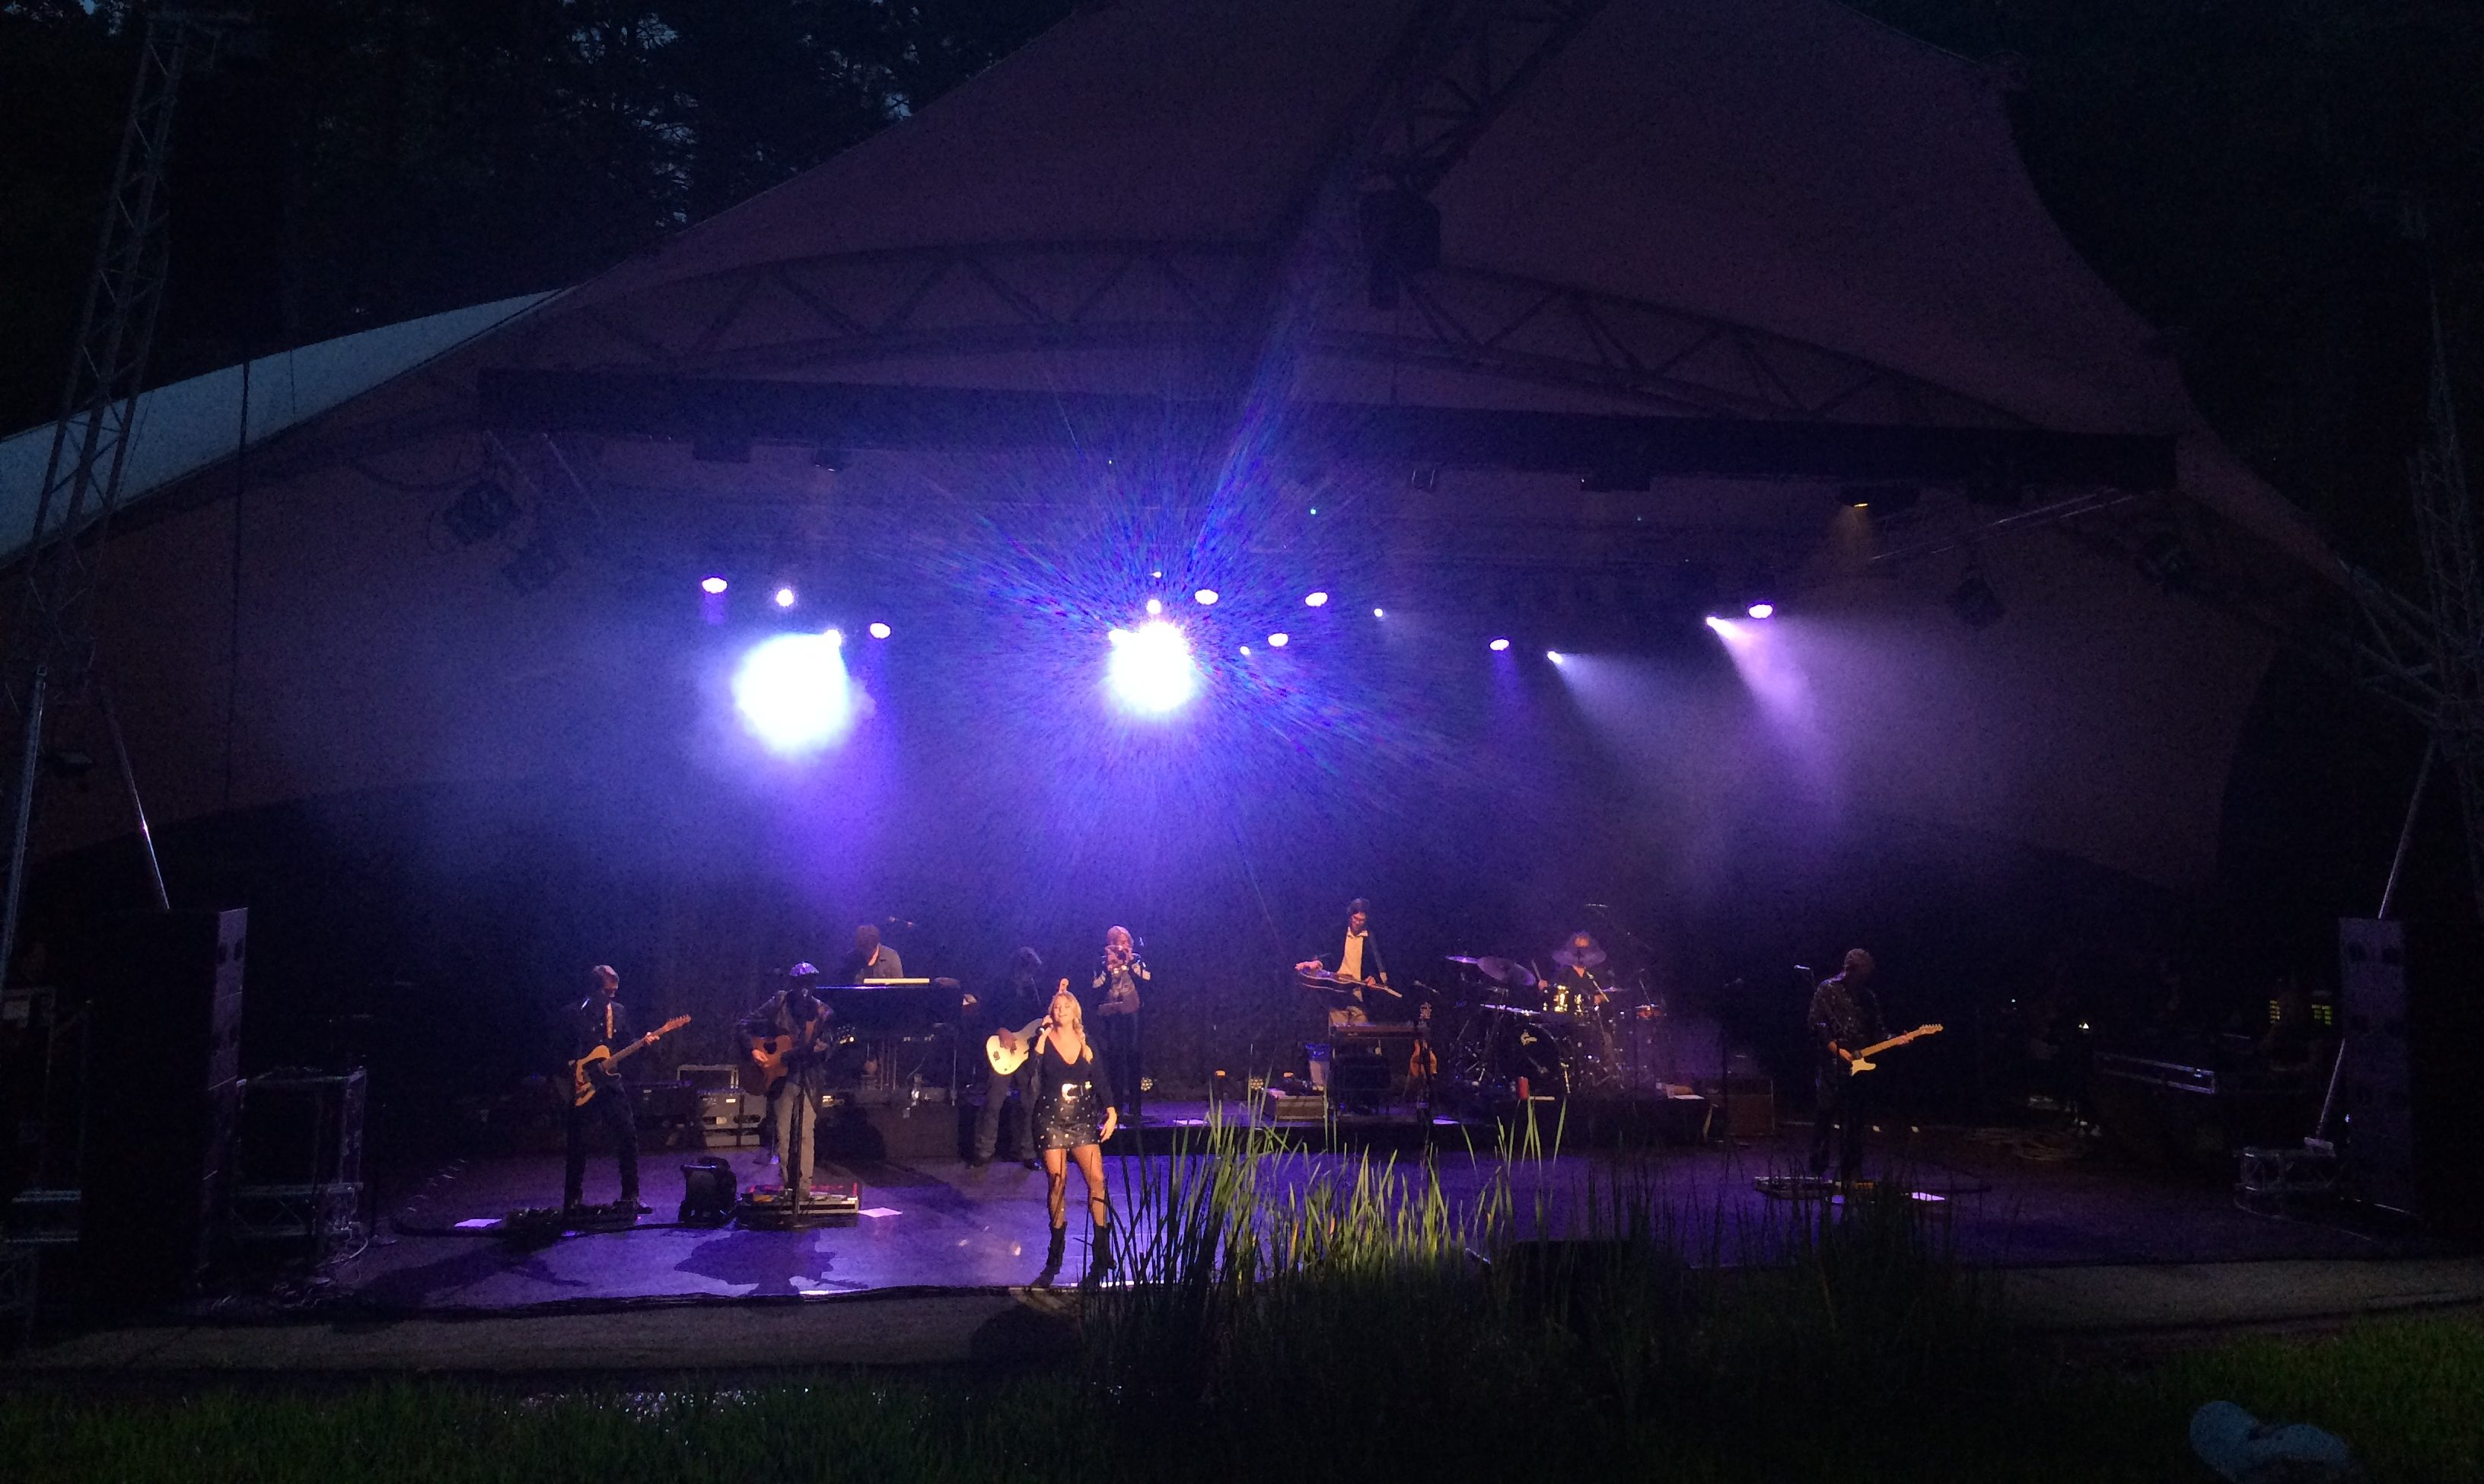 Concertreview: Famous In Small Town Bloemendaal – Miranda Lambert